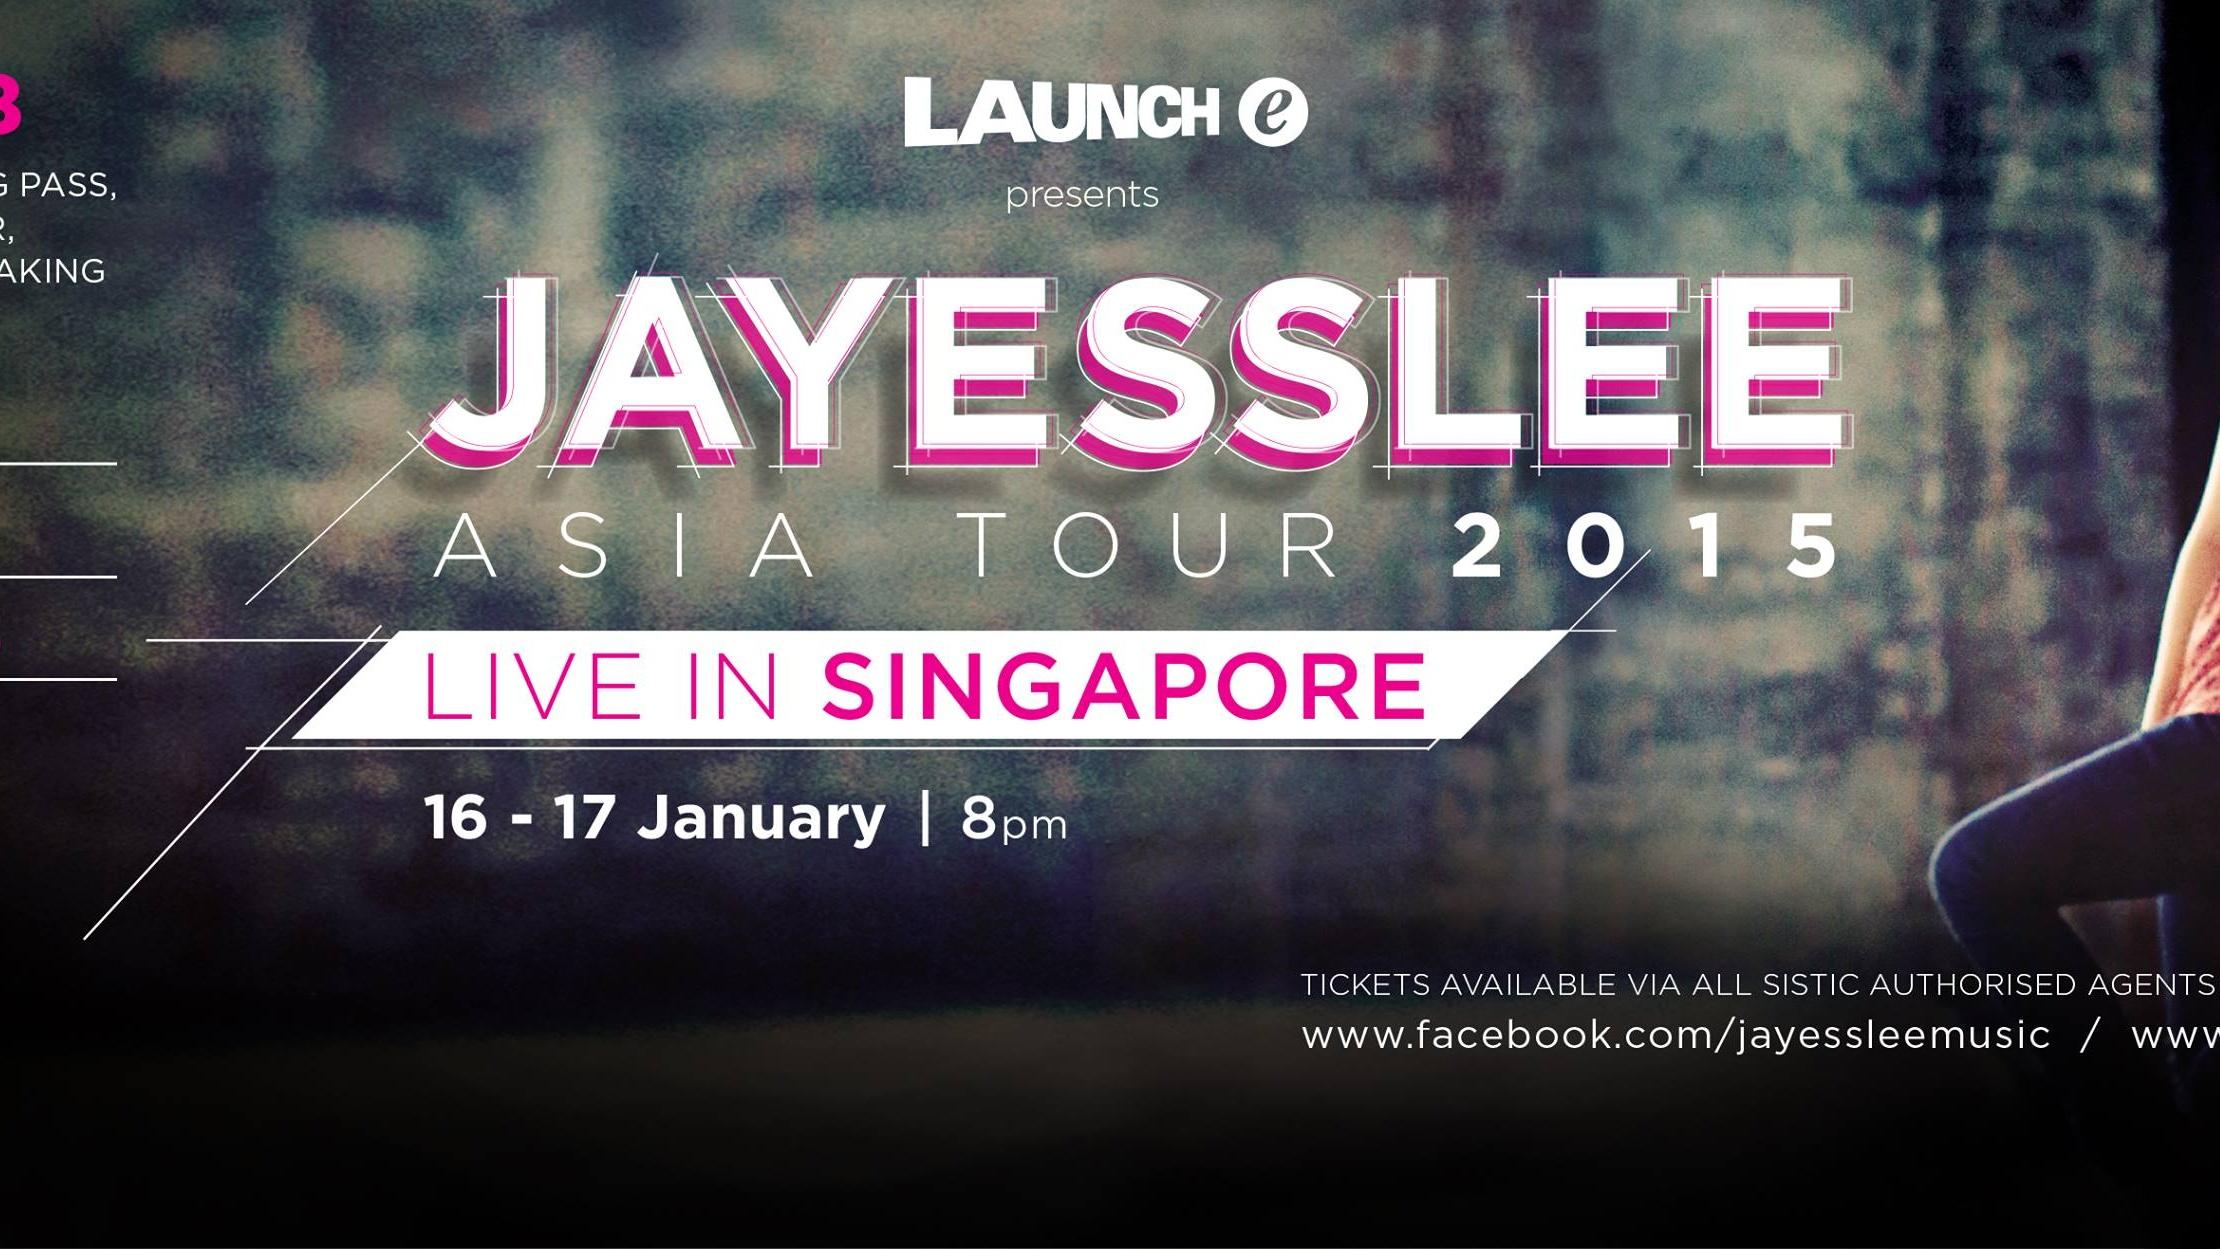 JAYESSLEE ASIA TOUR 2015 - SINGAPORE